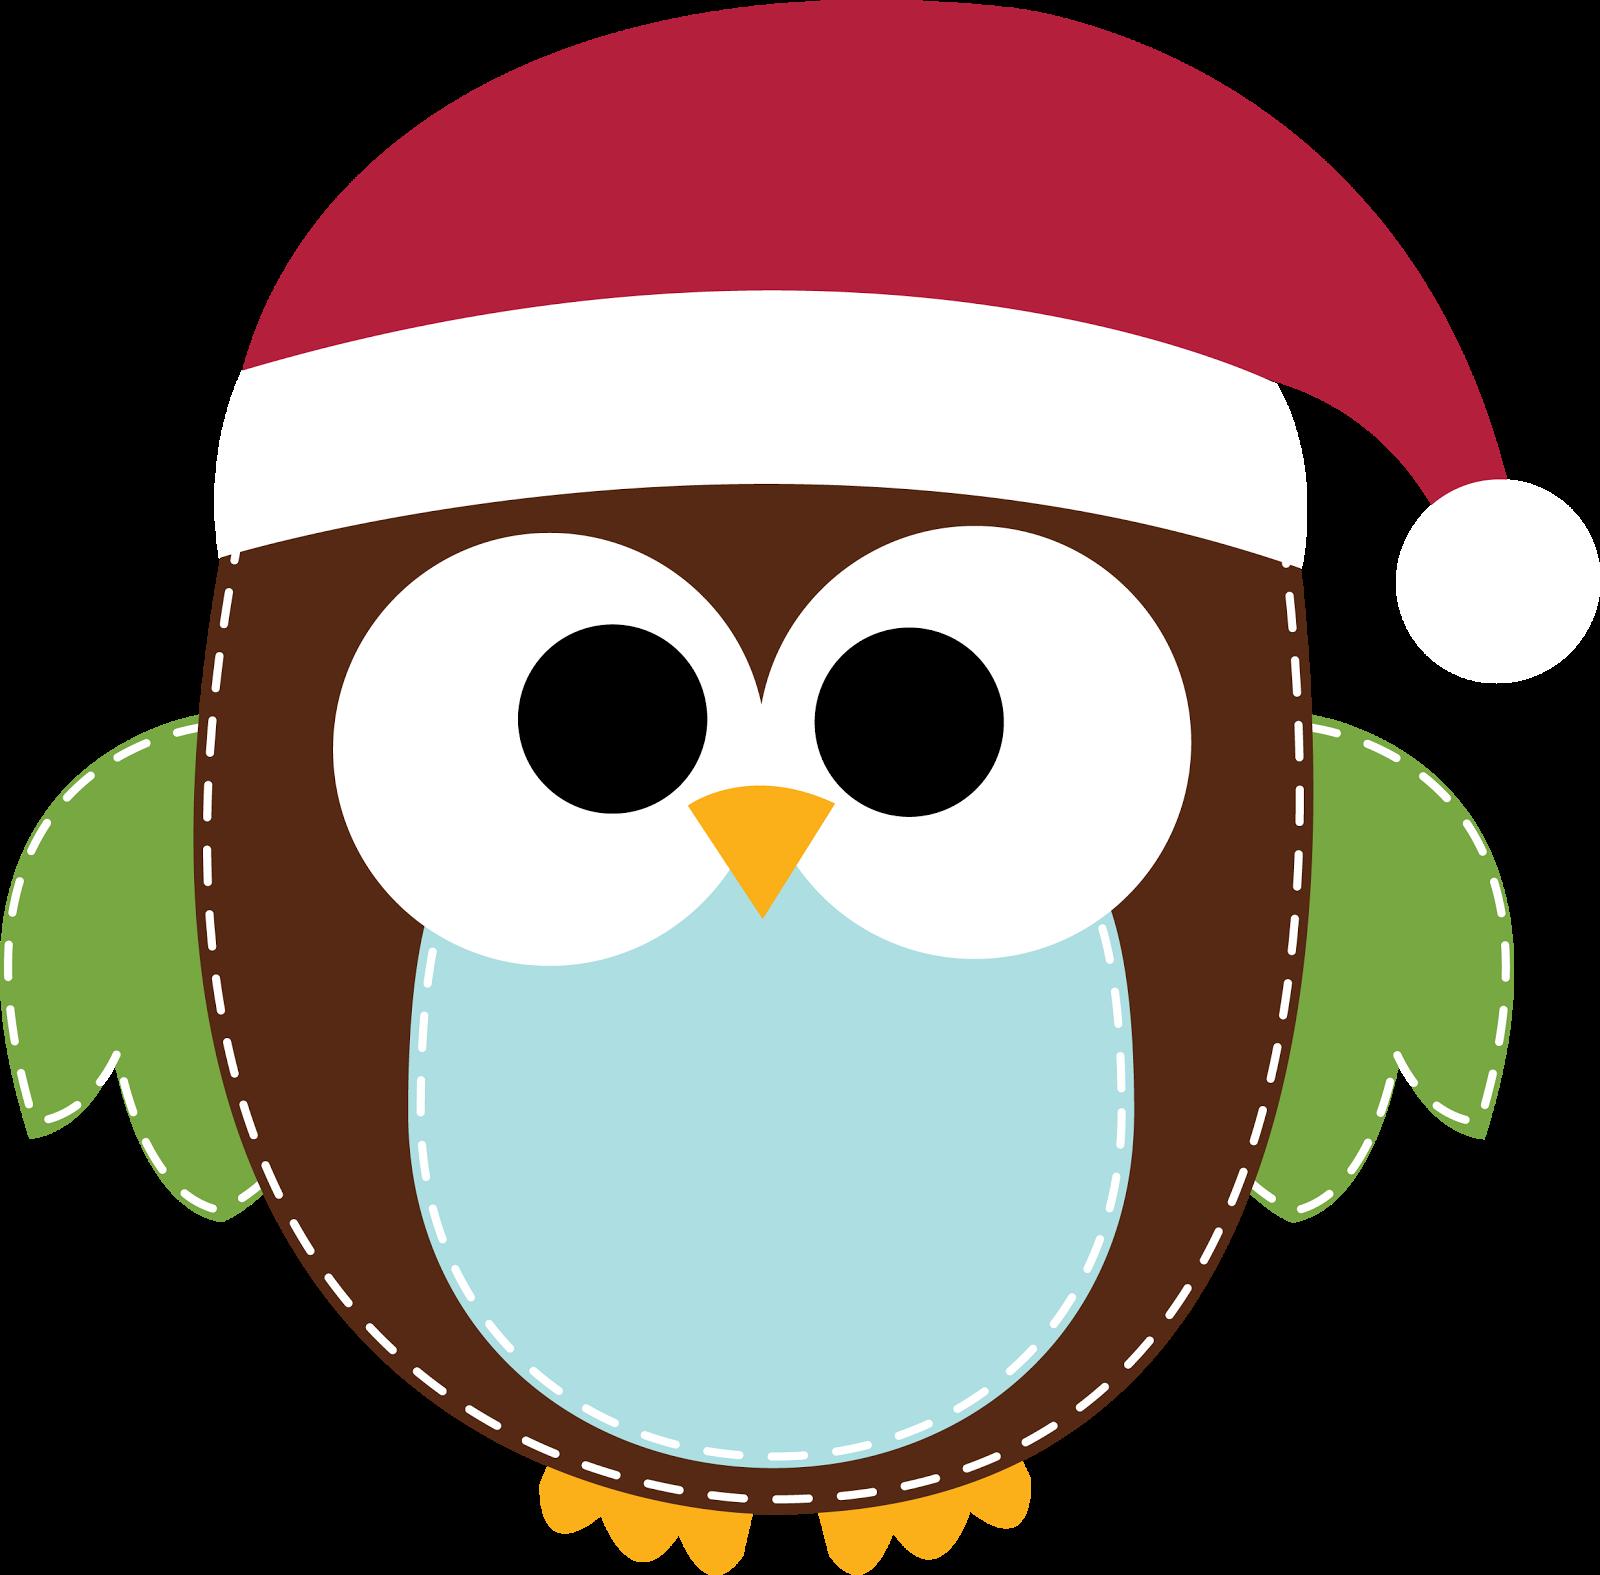 Happy holidays clipart mybloggingdiary - Cliparting.com